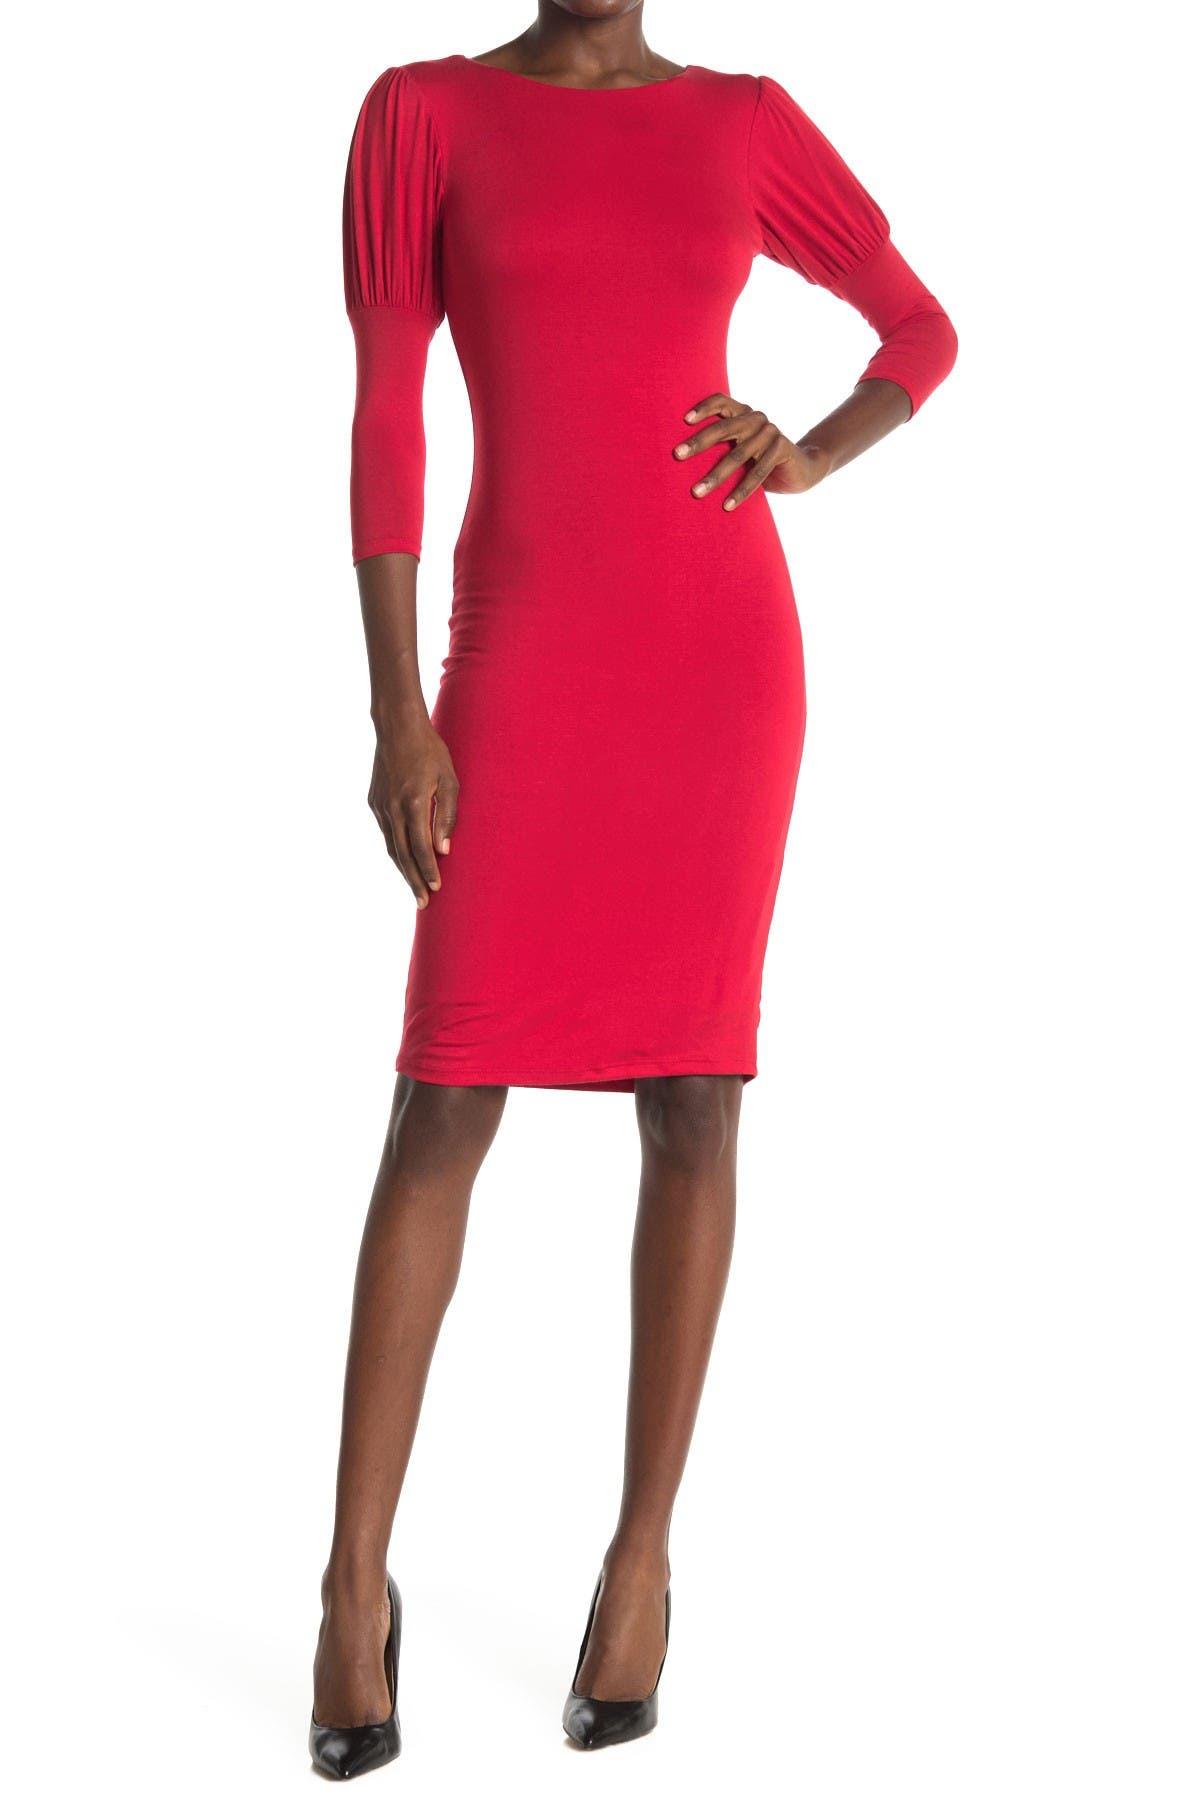 Image of Velvet Torch Puff Sleeve Round Neck Dress